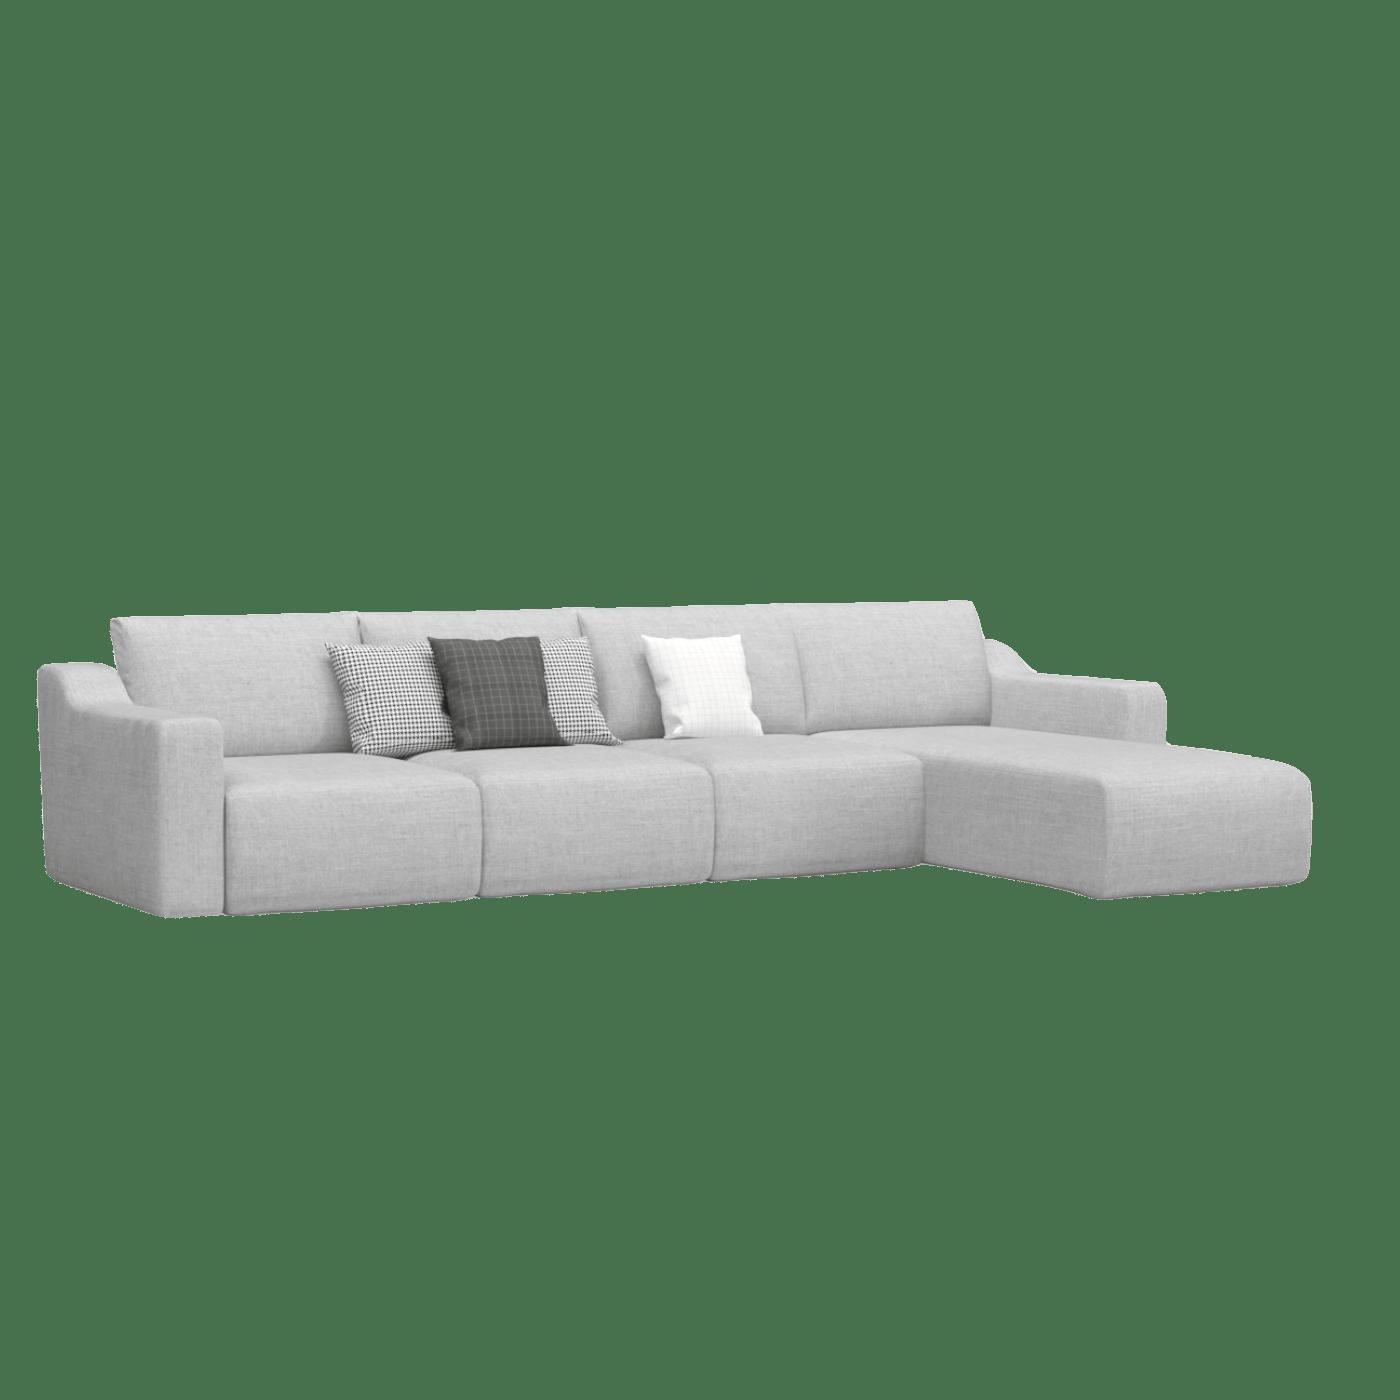 Ellender 3 seater sofa + Chaise